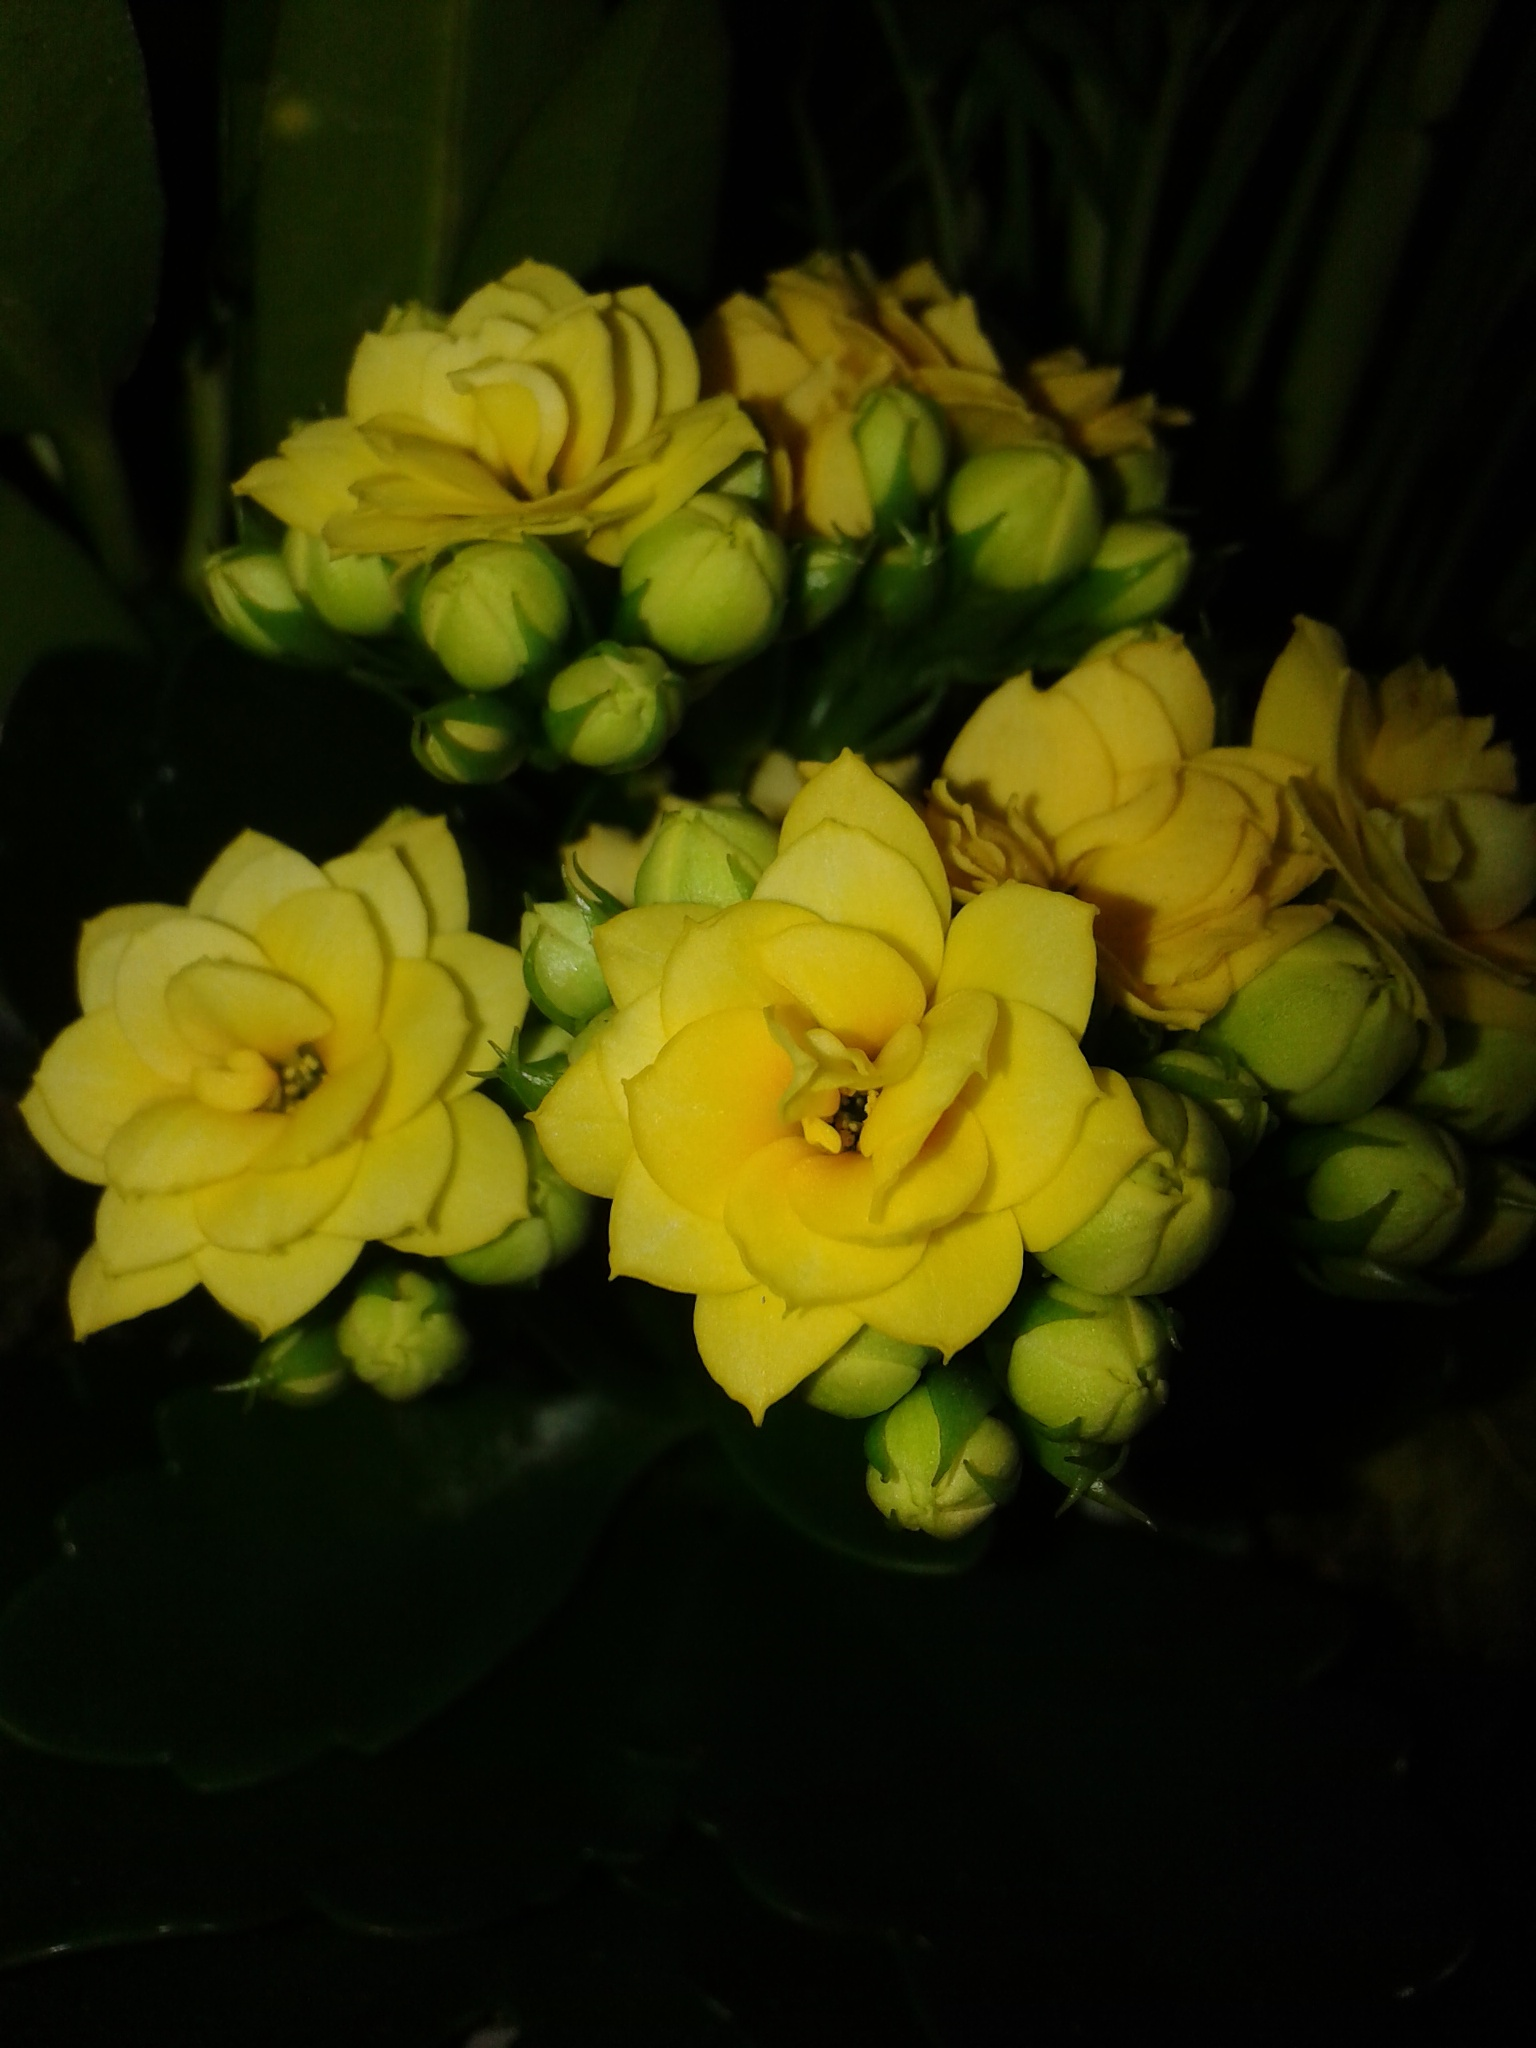 Small flowers-2 by uzkuraitiene62